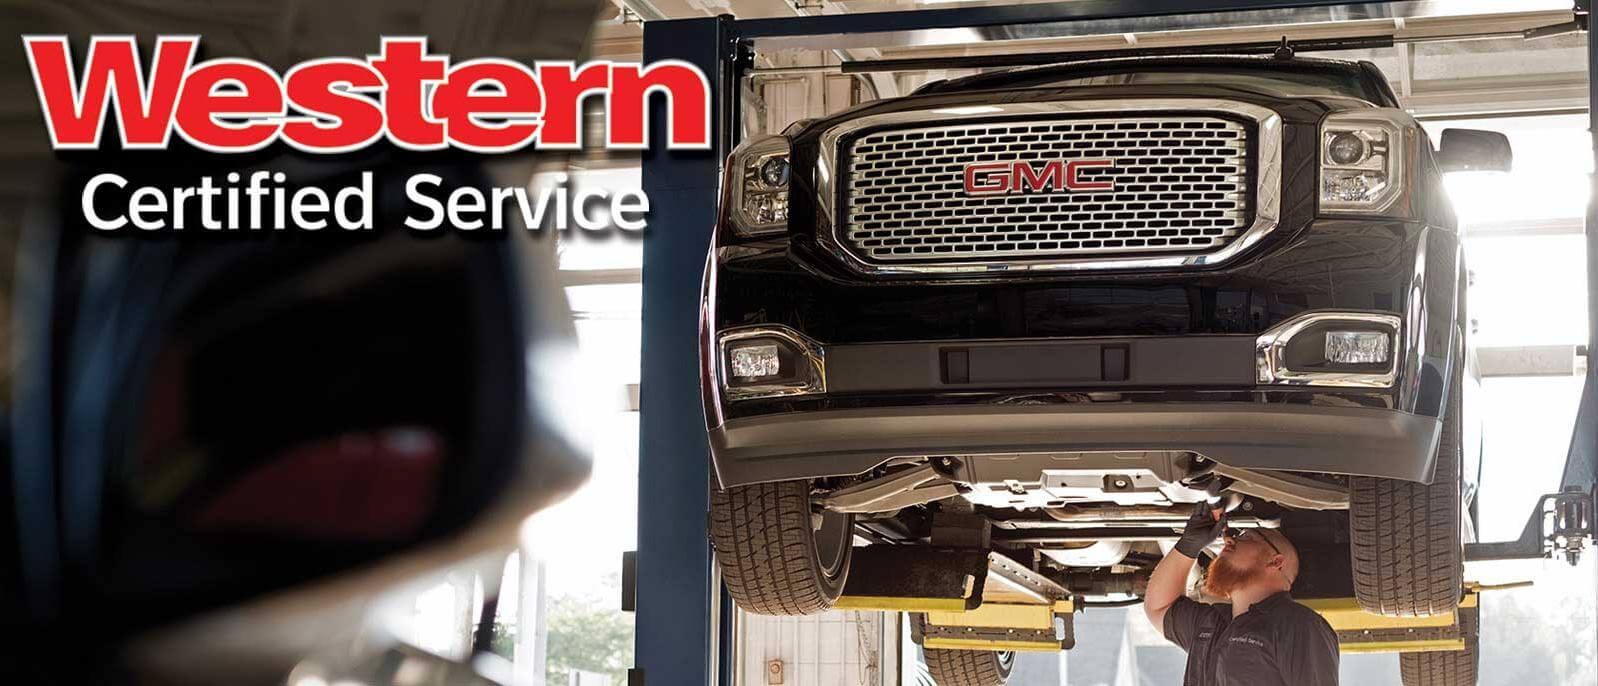 Western GMC Buick Certified Service